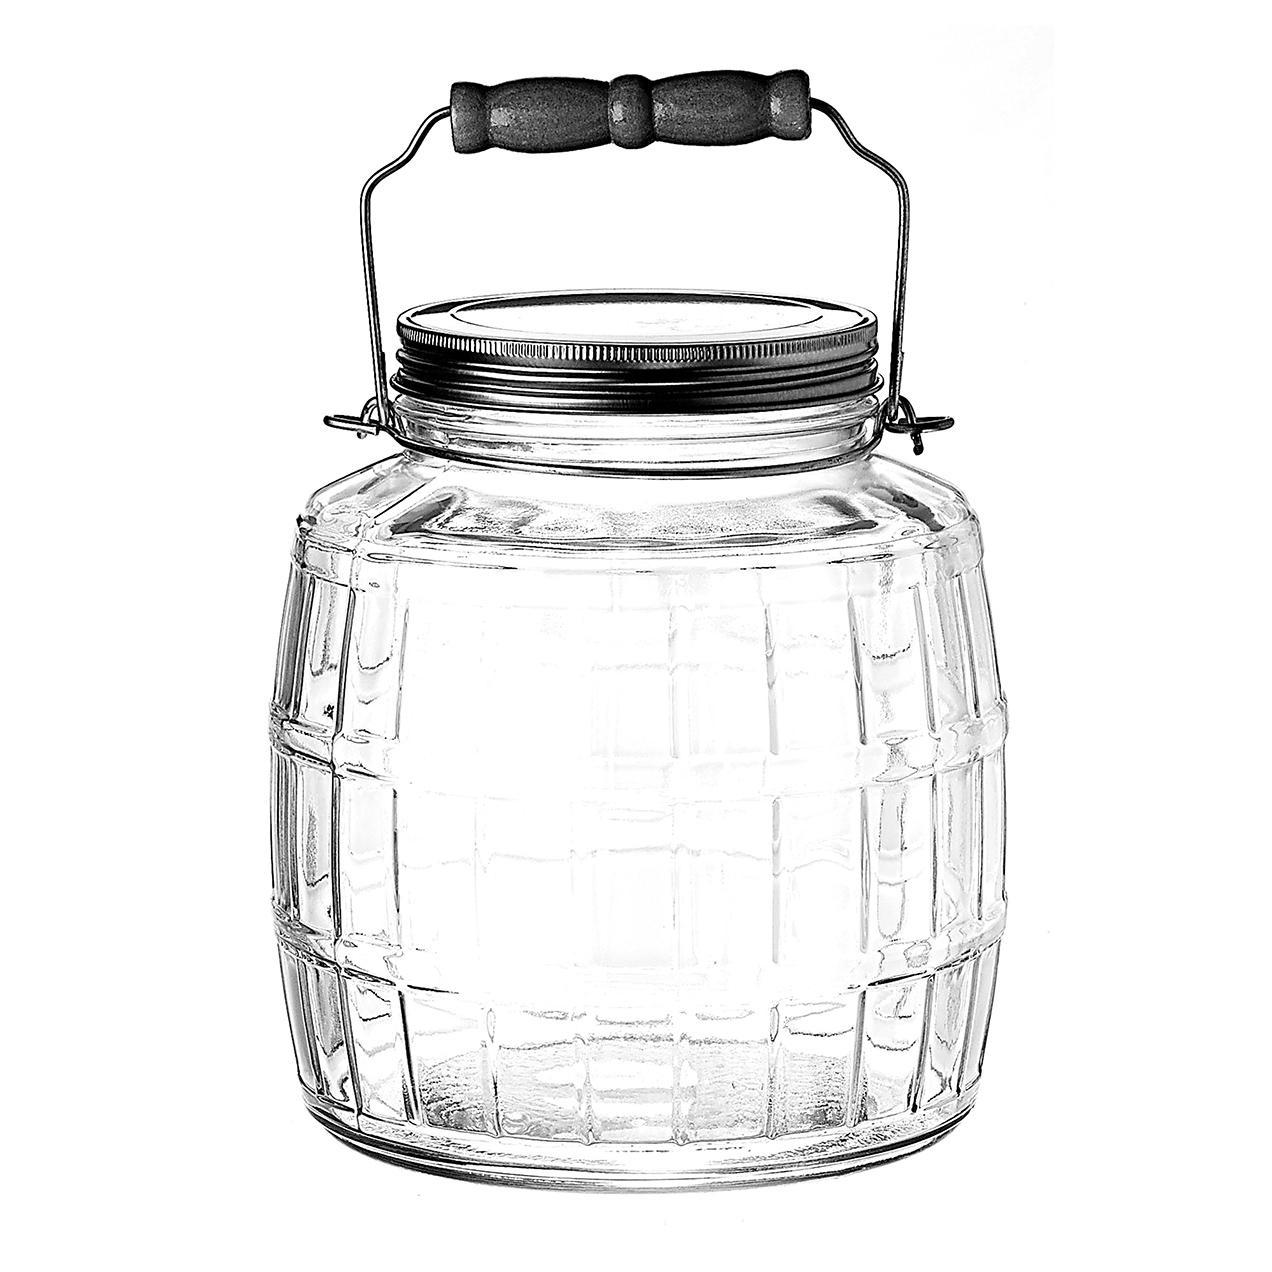 Anchor Hocking Foodservice 85728AHG17 storage jar / ingredient canister, glass